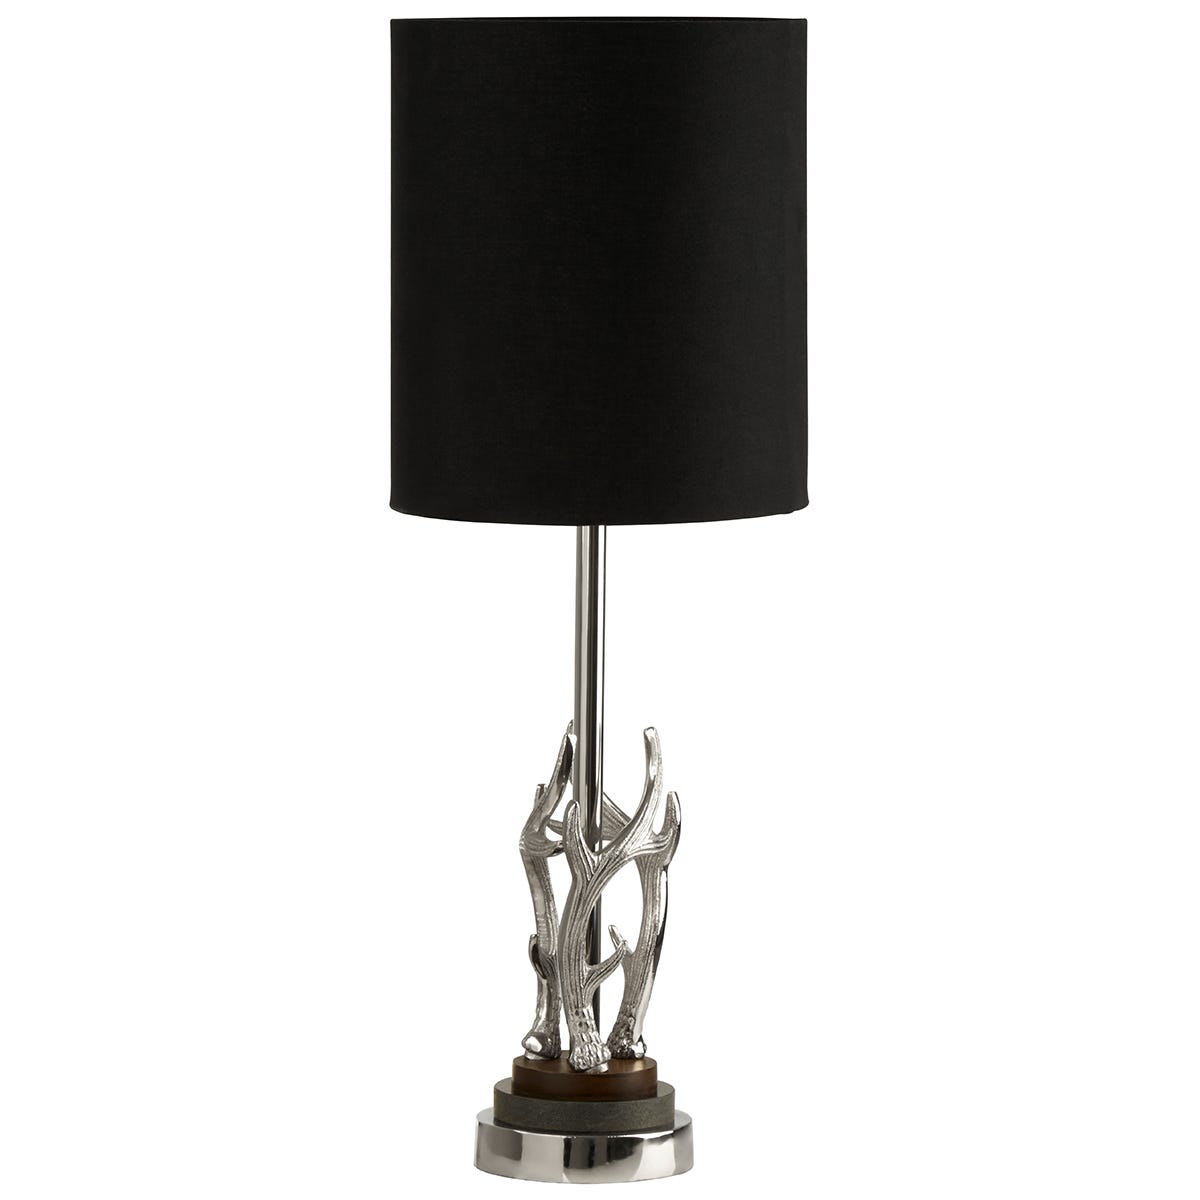 Premier Housewares Antler Table Lamp with Marble Base Aluminium & Black Drum Shade